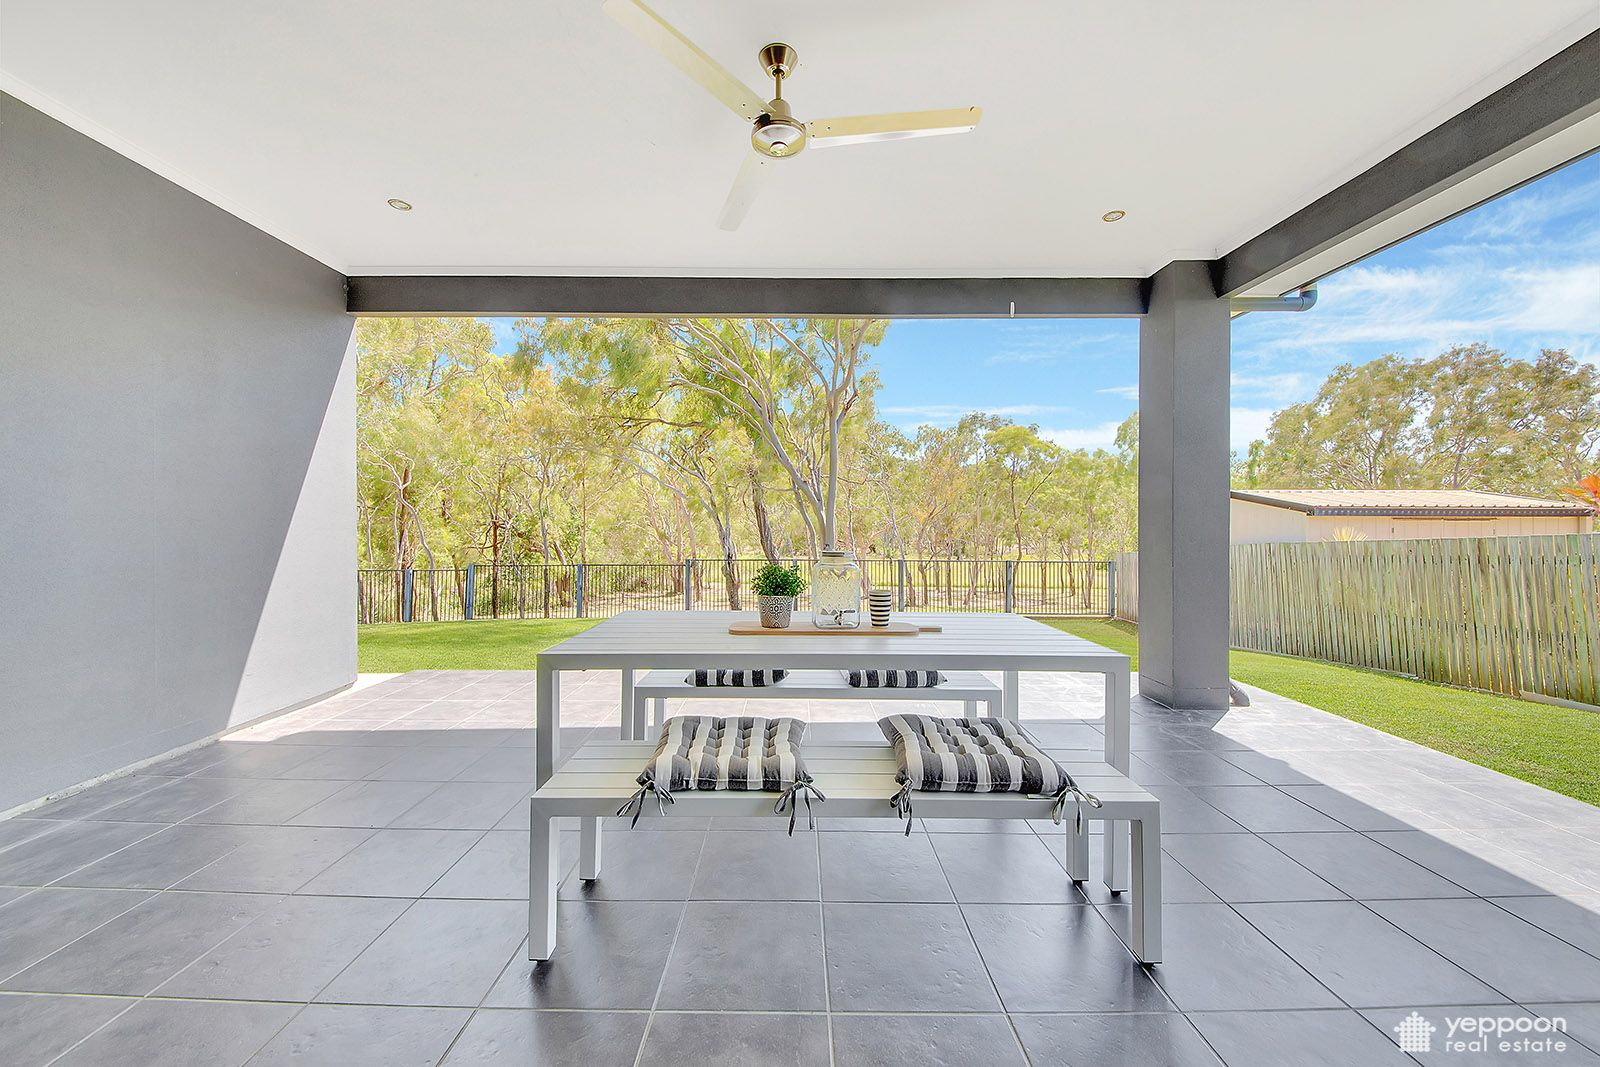 30 Frangipani Drive, Lammermoor QLD 4703, Image 1